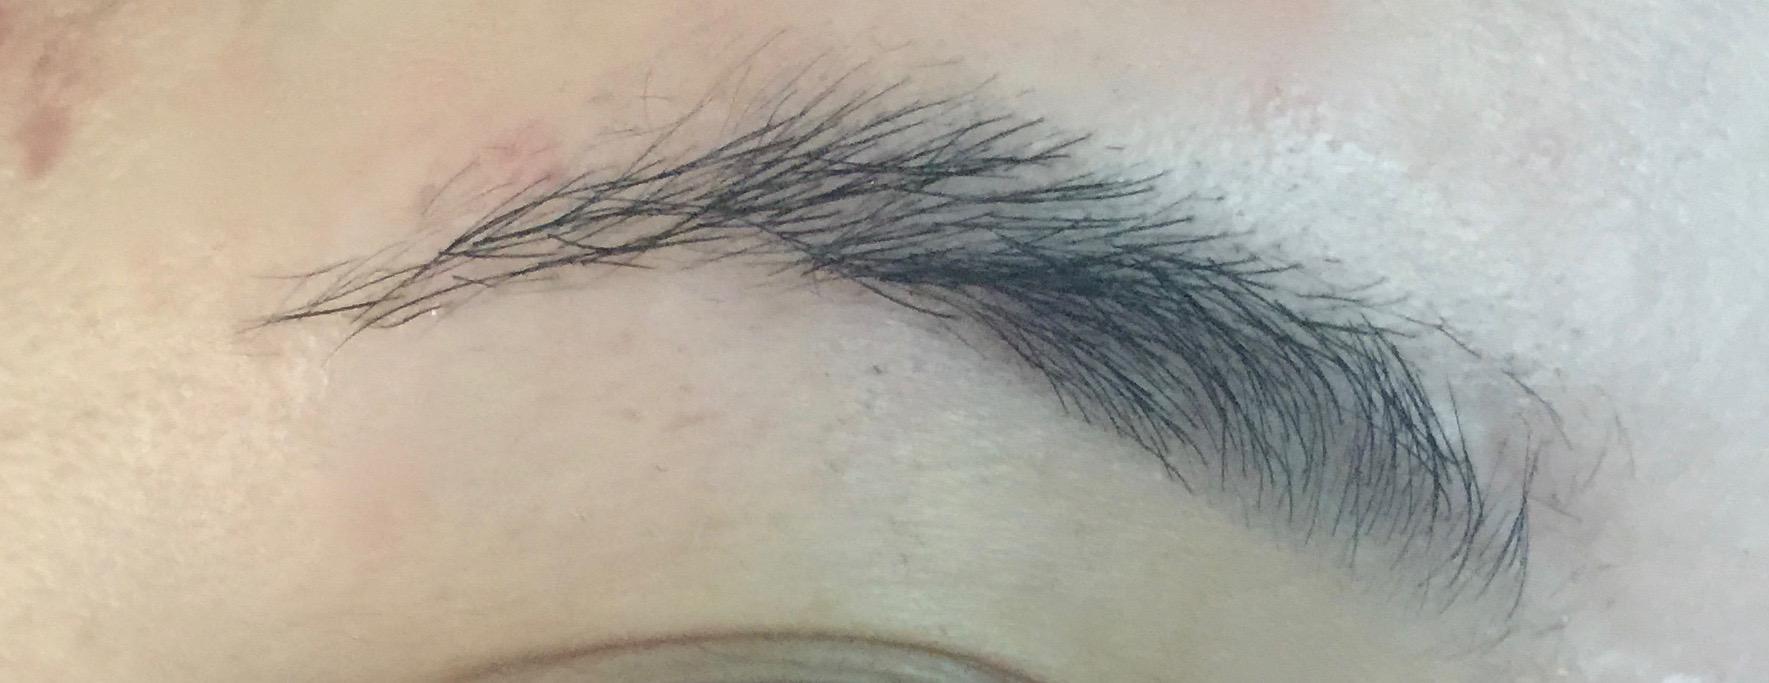 Natural  | Right eyebrow